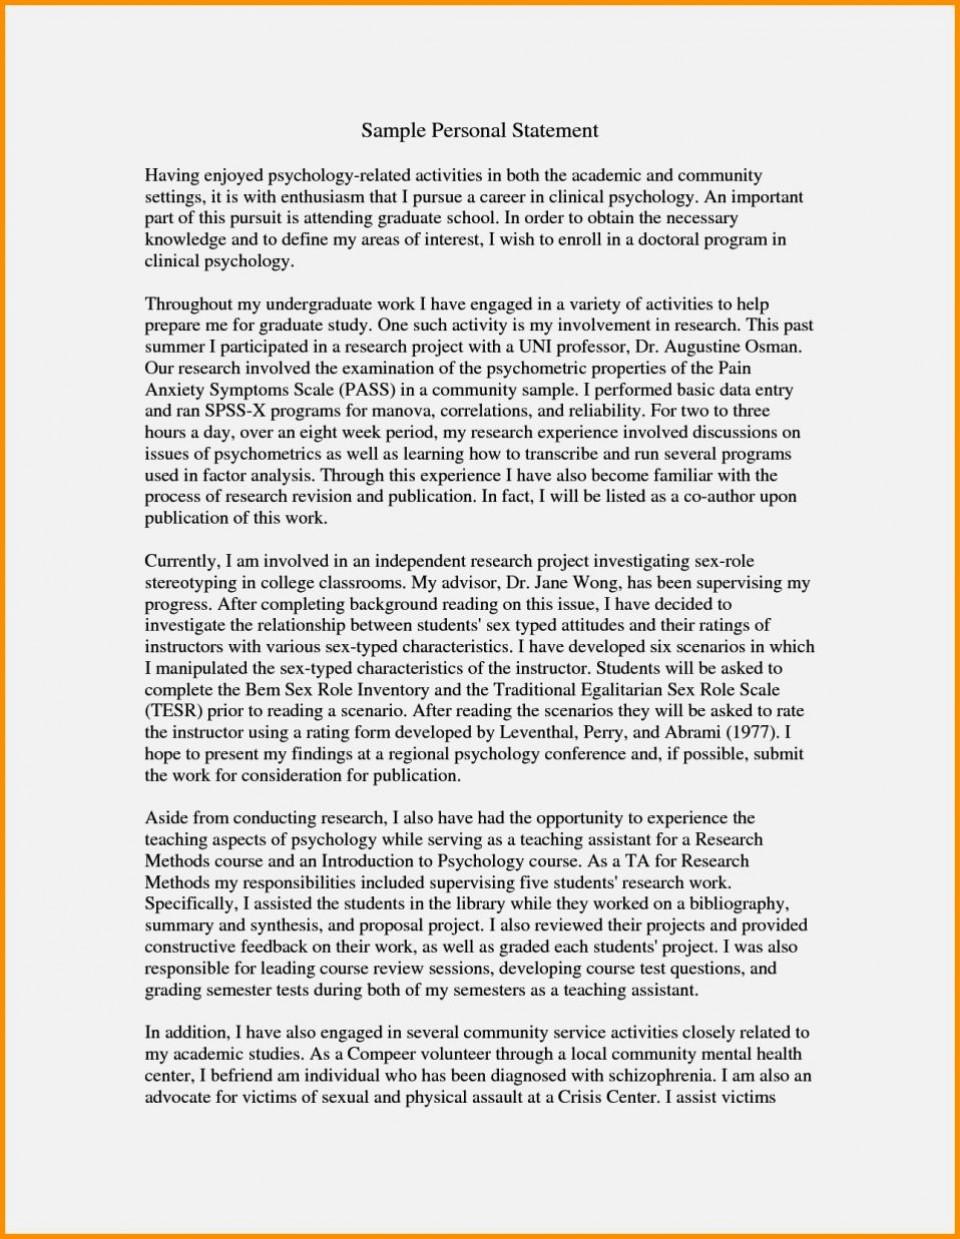 023 Essay For Graduate Admission Example Admissions Surprising Nursing School Personal 960